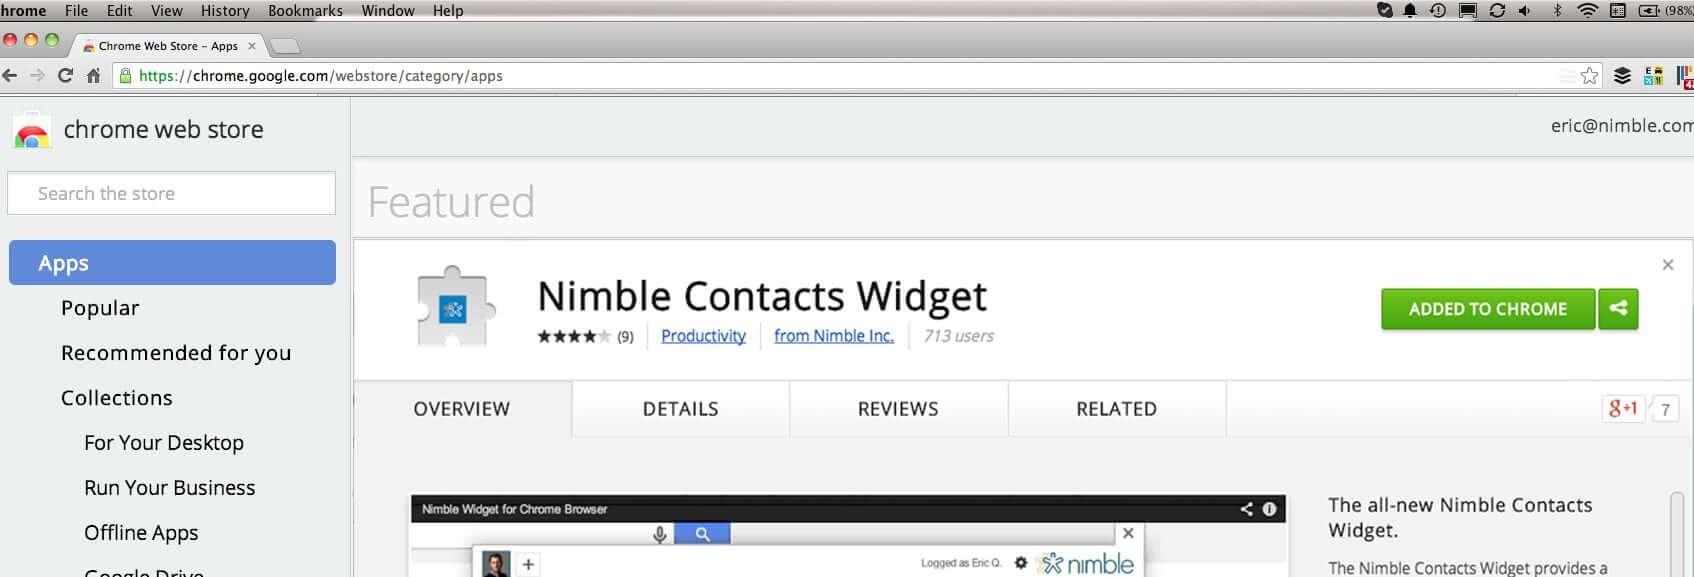 Nimble Contacts Widget for Chrome